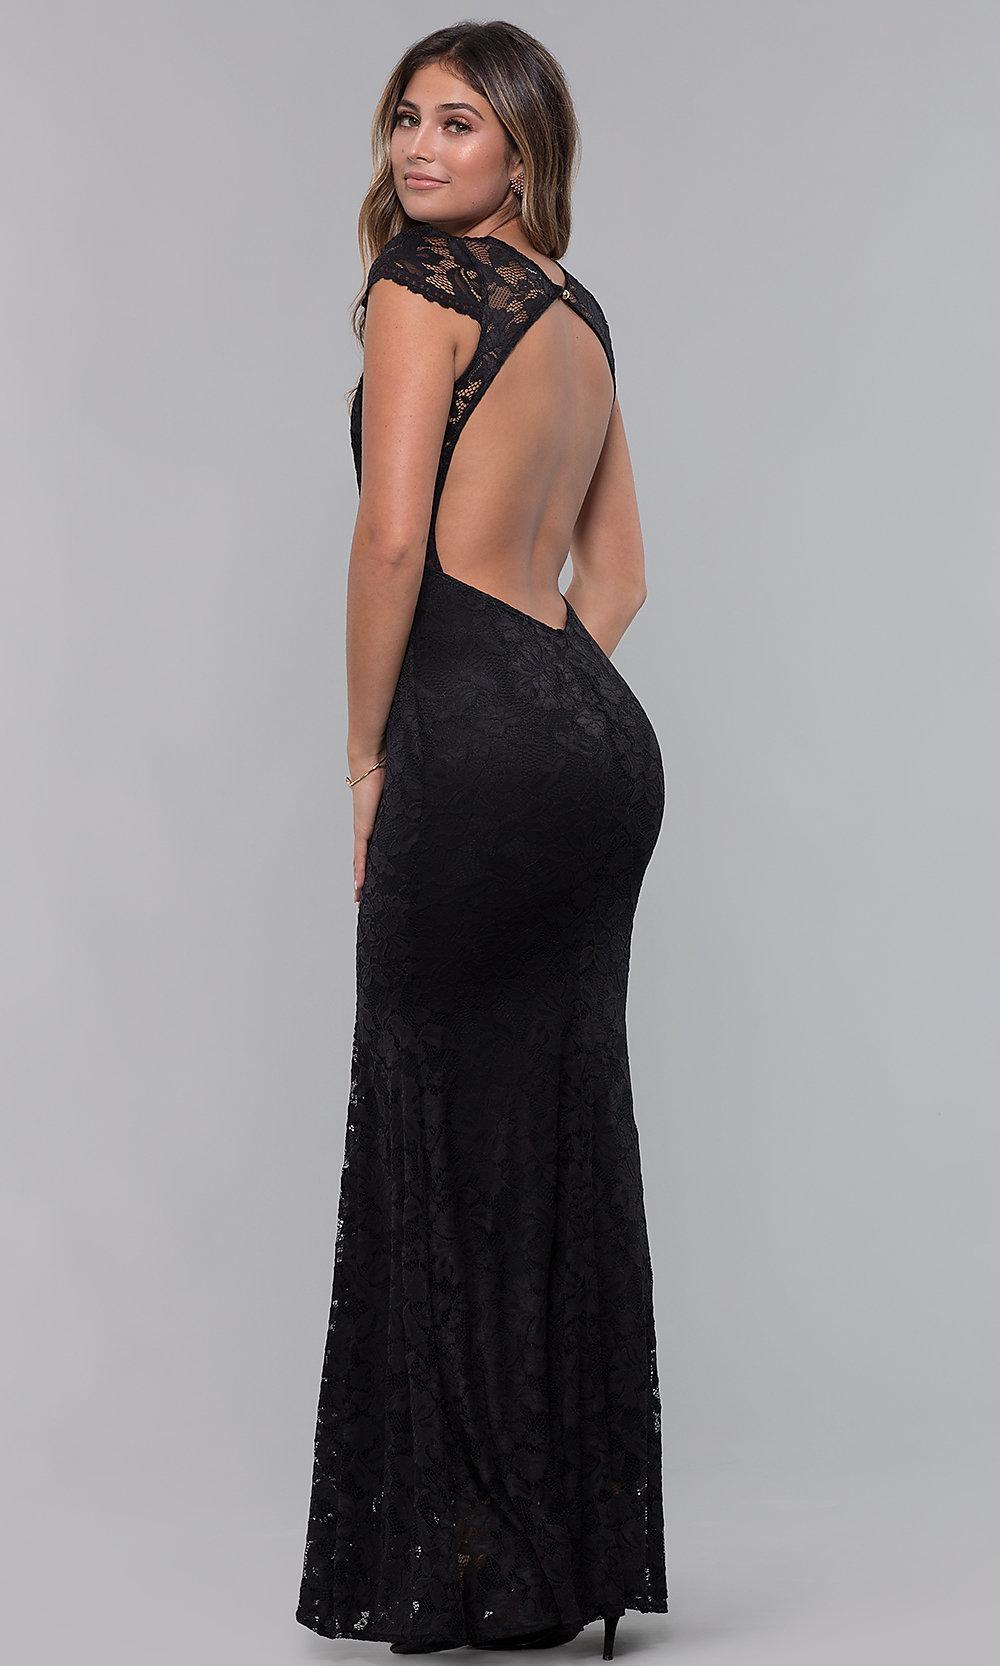 Long open back V-neck black prom dress back-side